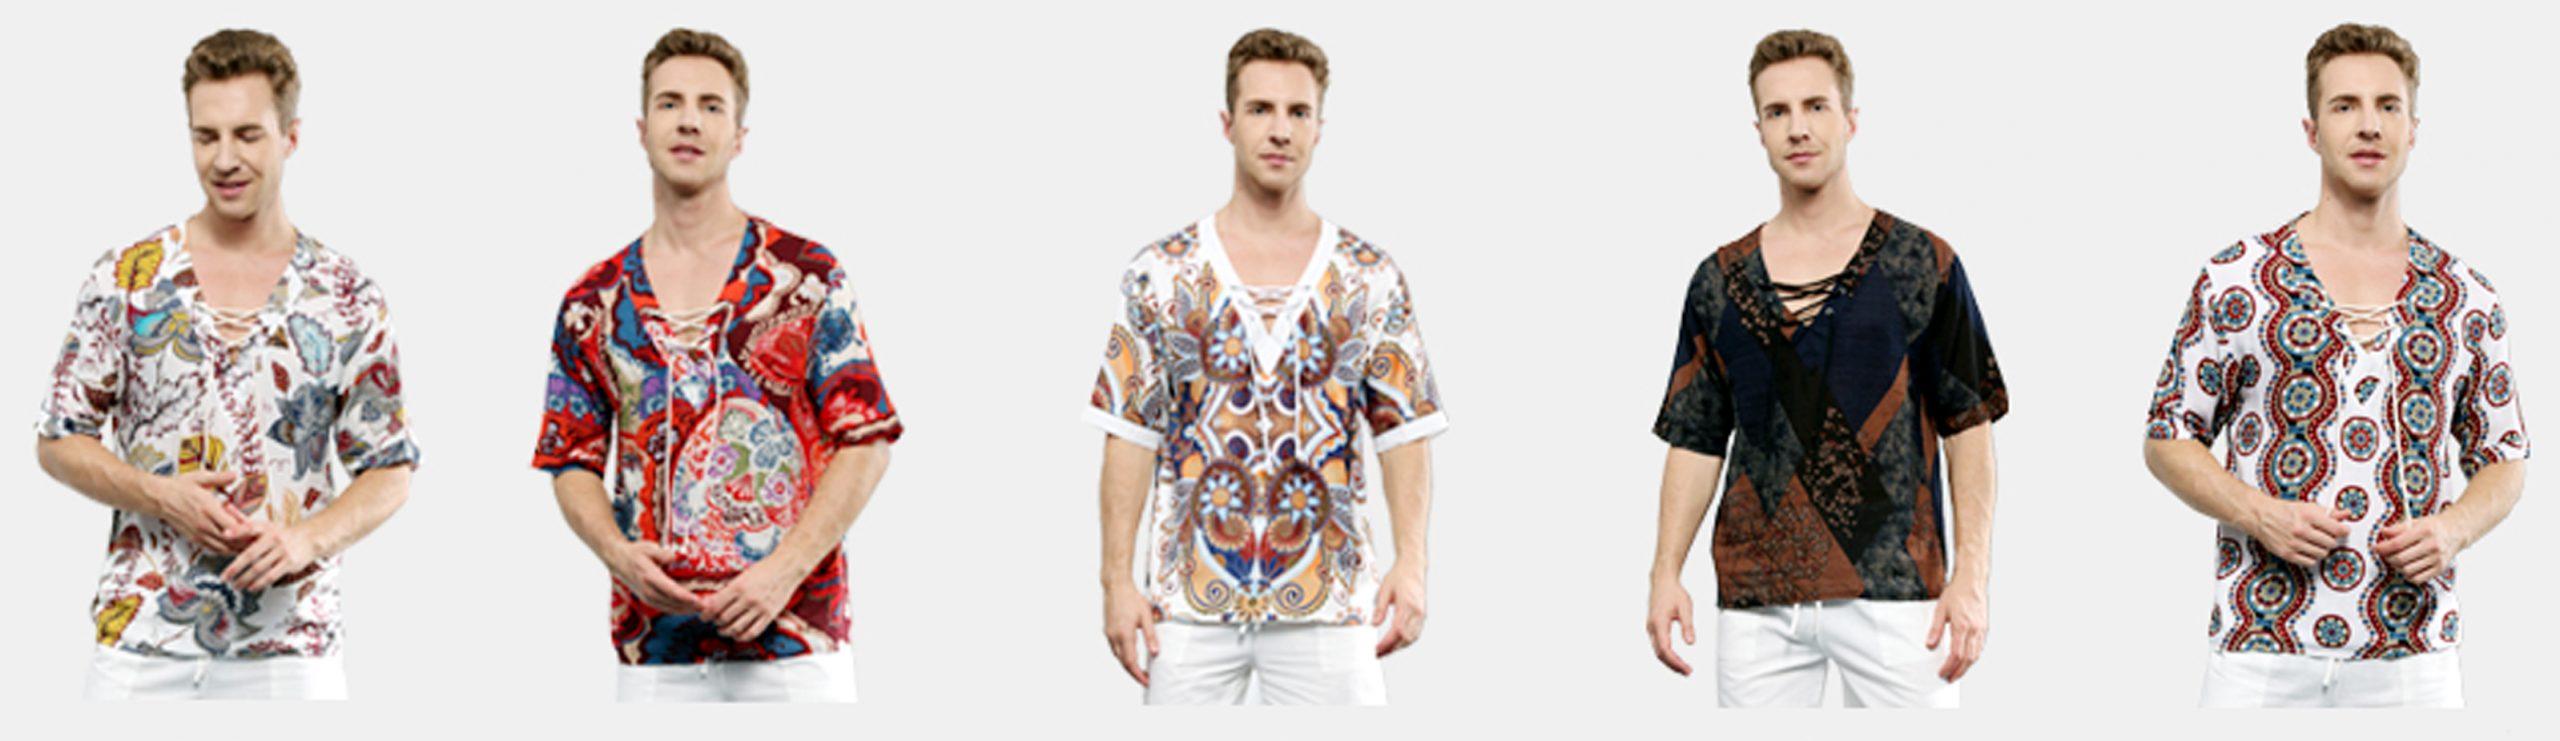 Men's Dress Shirts Styles